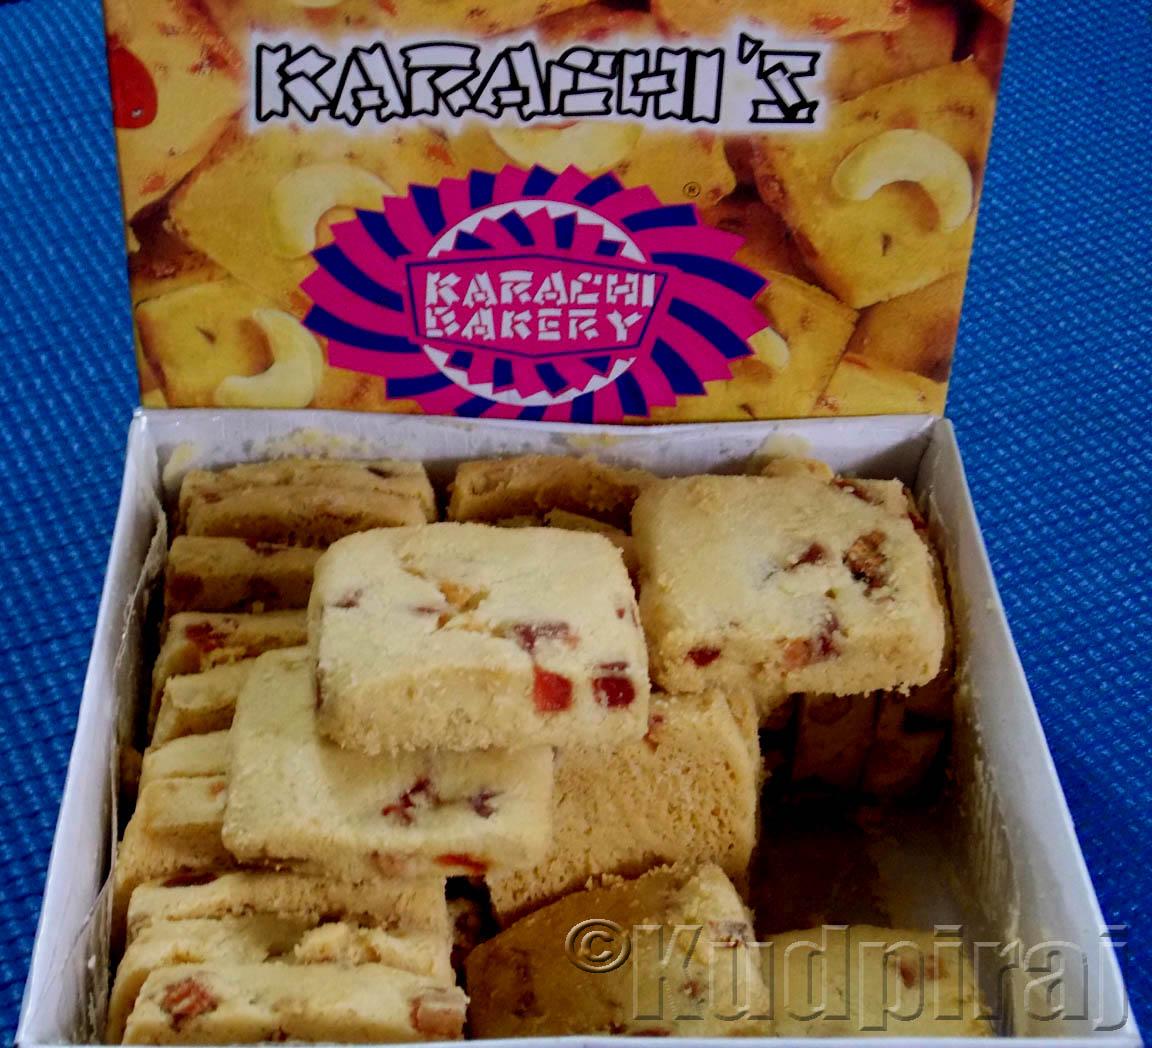 Karachi bakery in bangalore dating 7